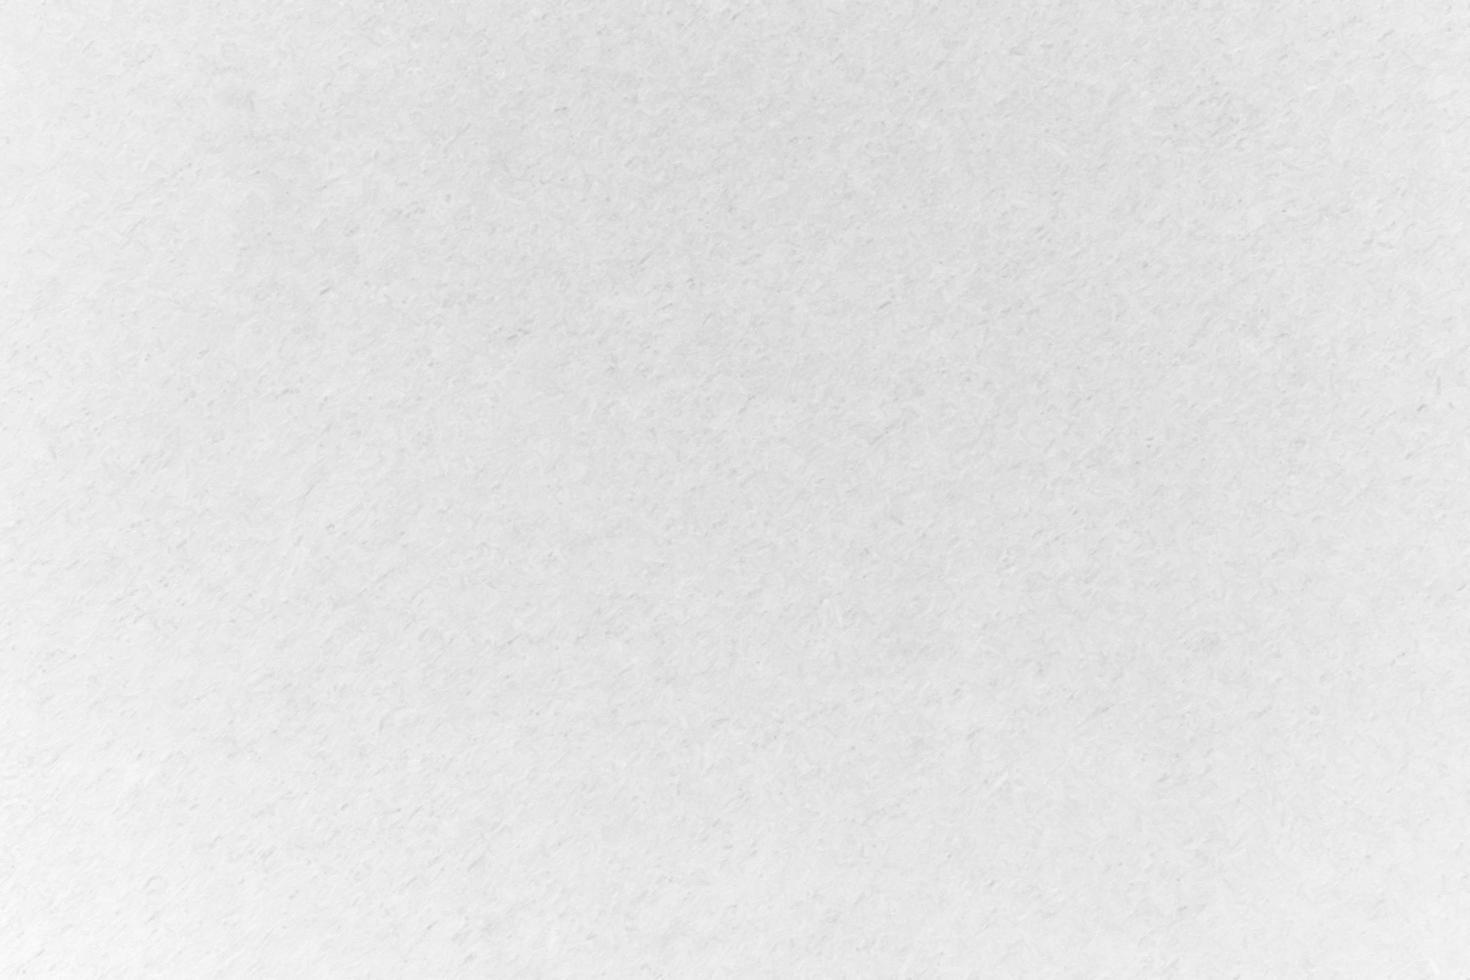 sfondo bianco tela astratta strutturata. foto